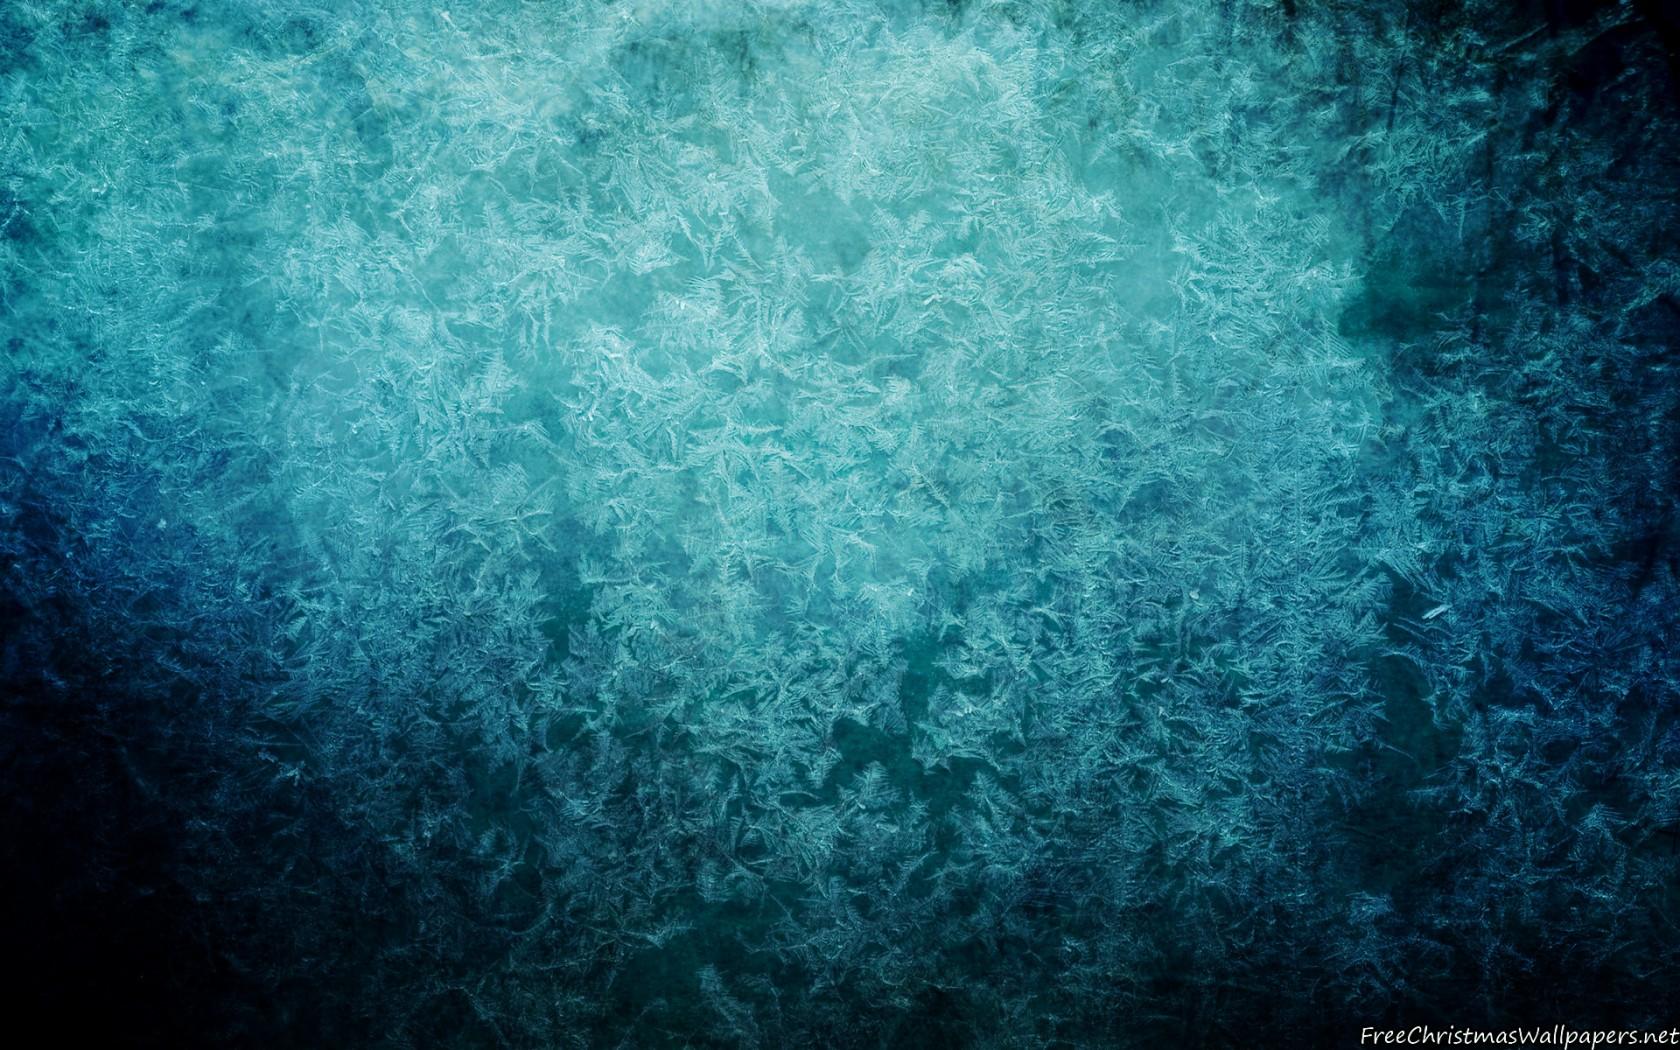 Christmas Winter Ice - Wallpaper - FreeChristmasWallpapers.net